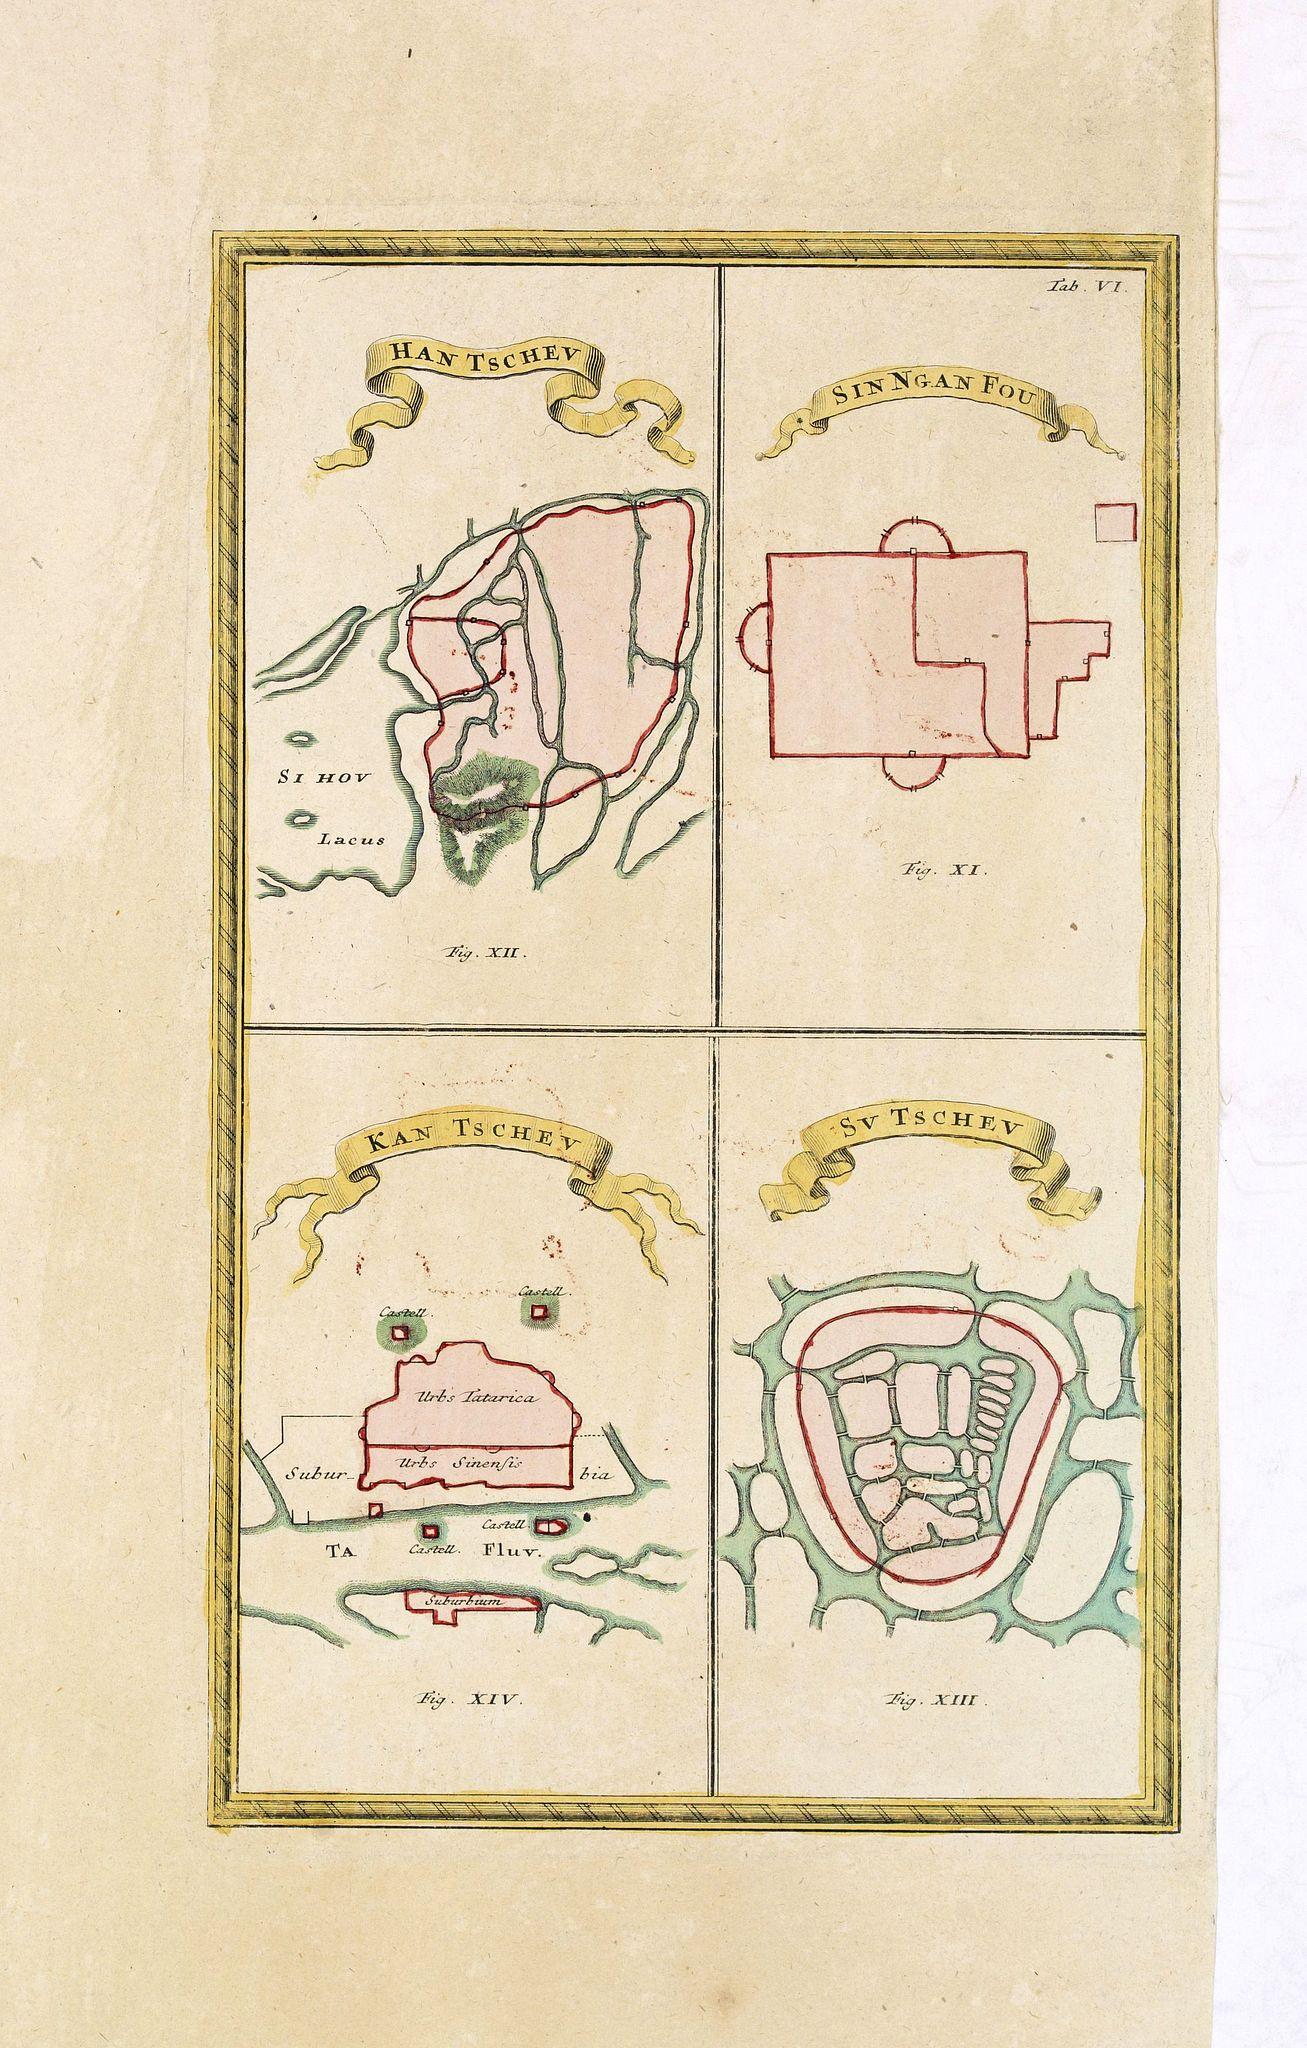 HASE, J, M. -  [ Four plans on one sheet] Han Tscheu, Sinngan Fou (Singapore??), Kan Tscheu and Su Tscheu.